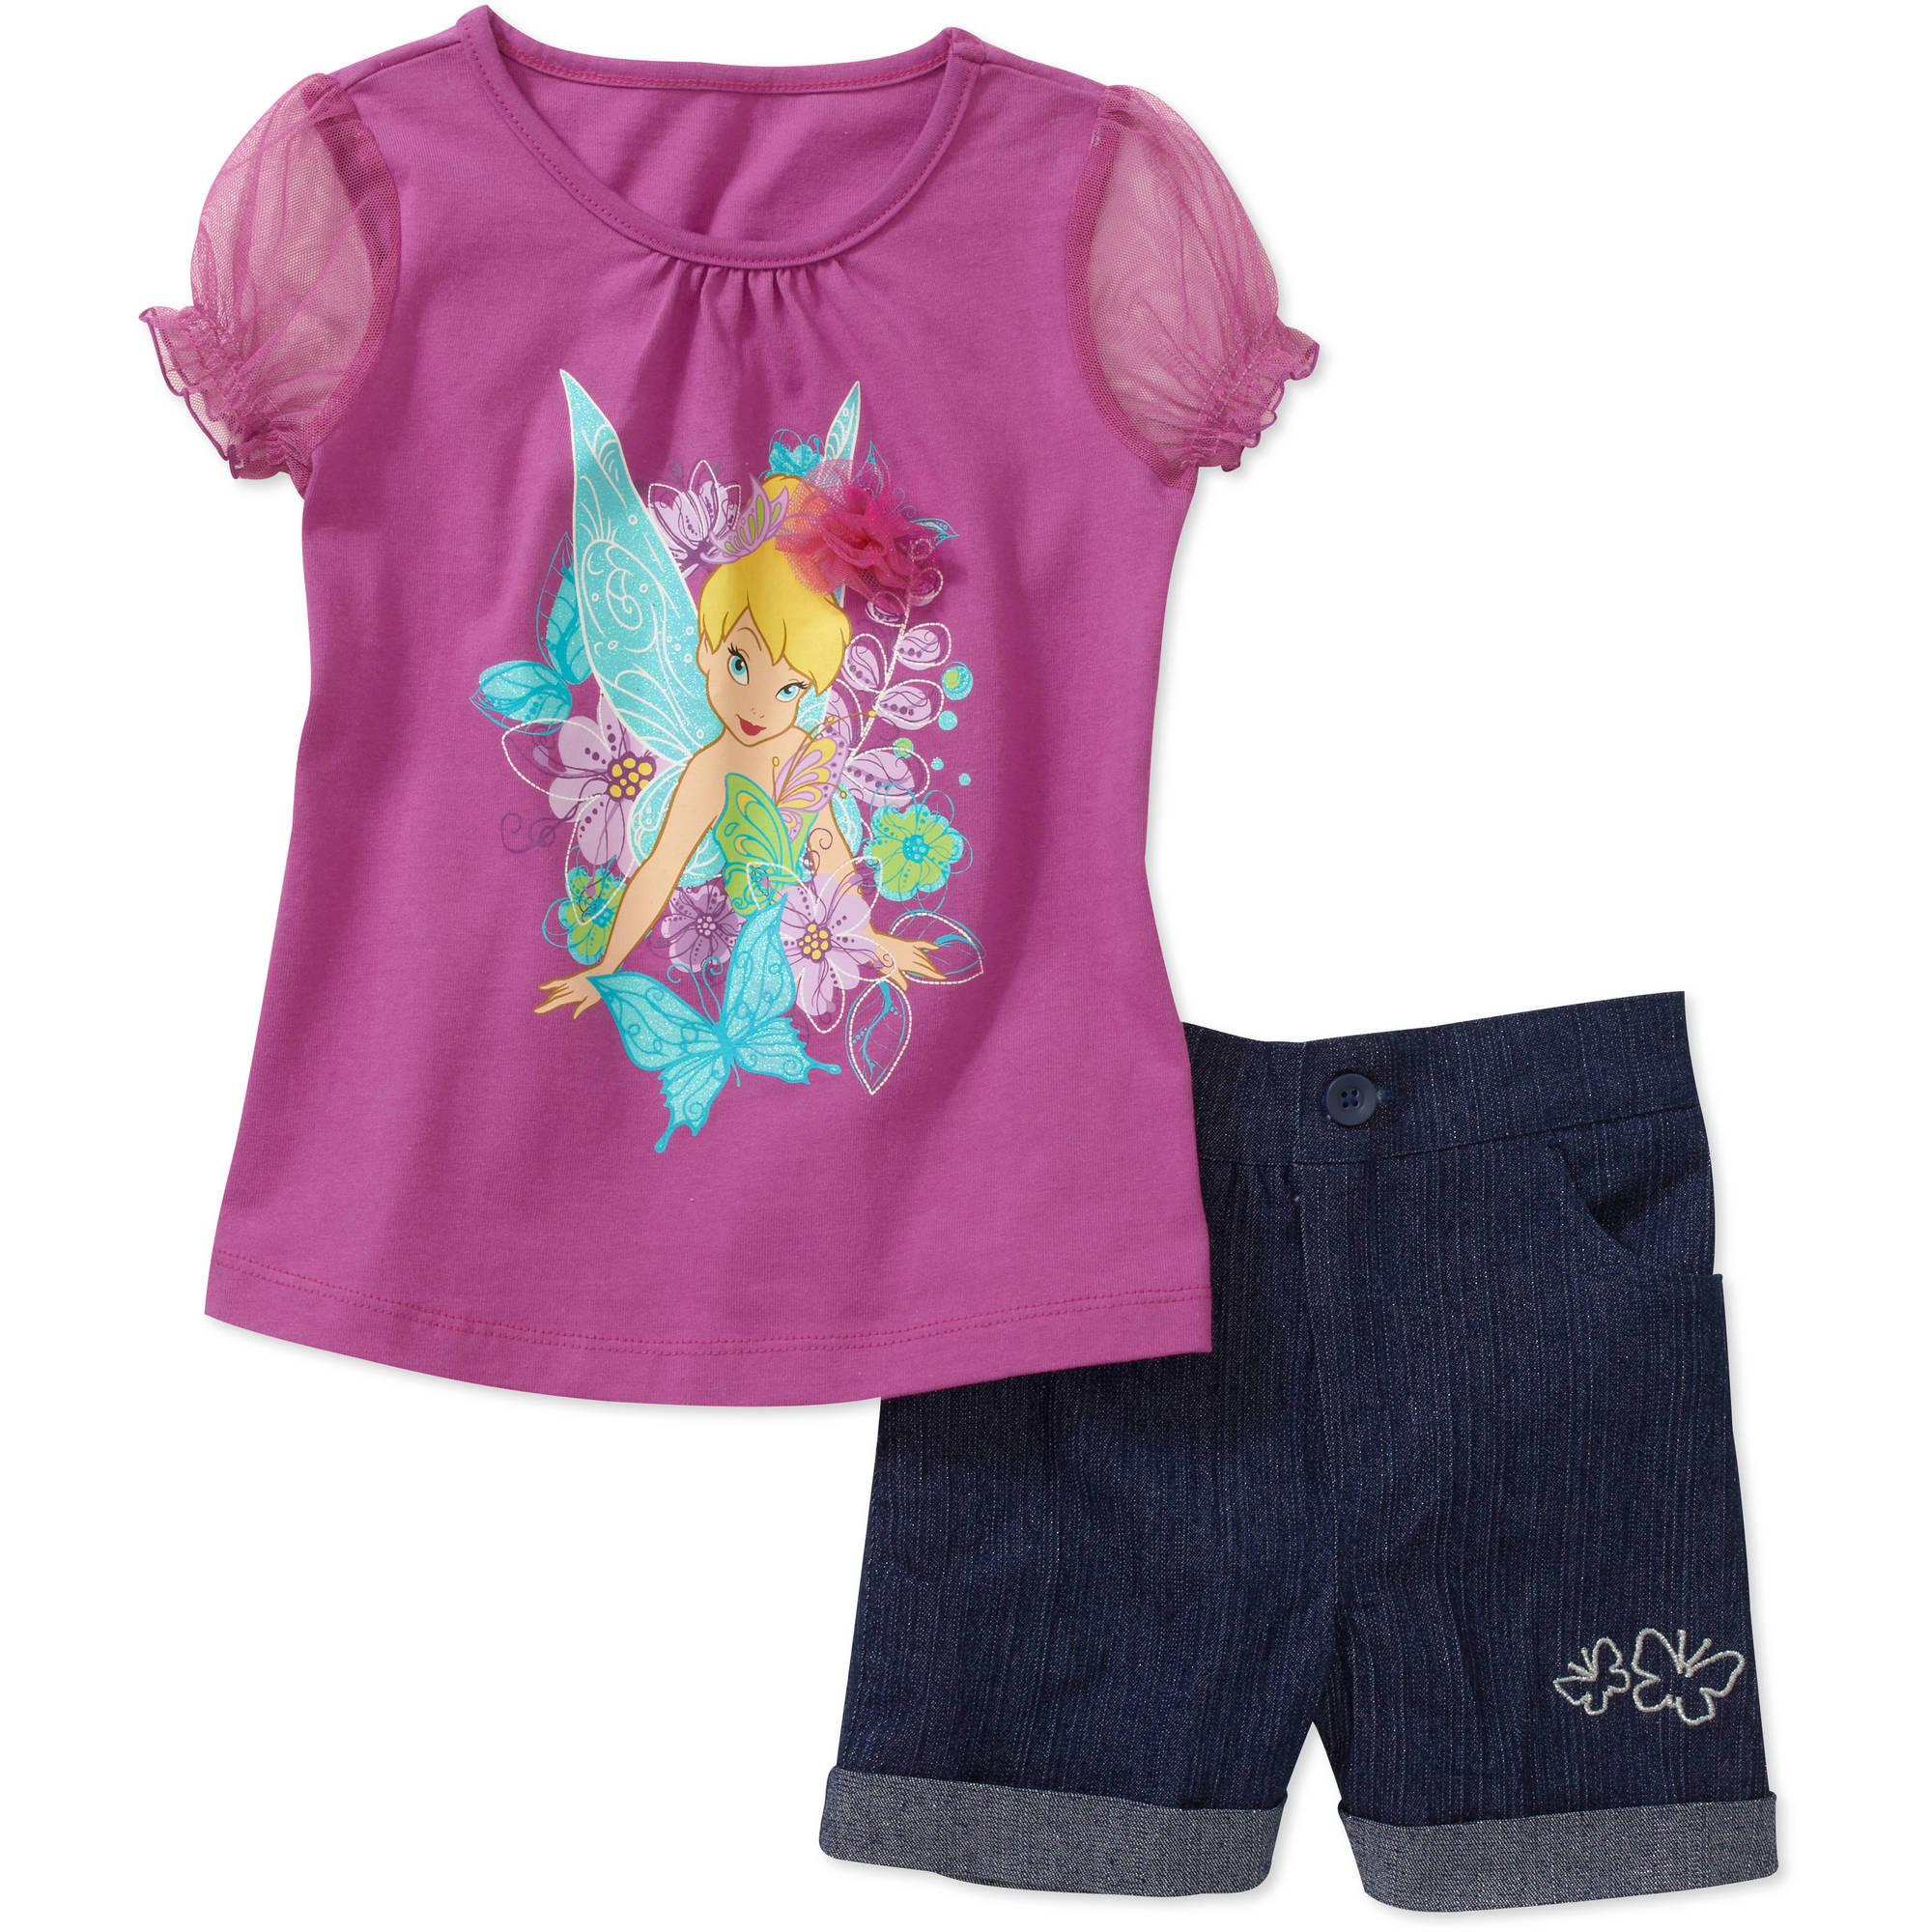 Disney Baby Girls' 2 Piece Tinkerbell Tee and Glitter Short Set